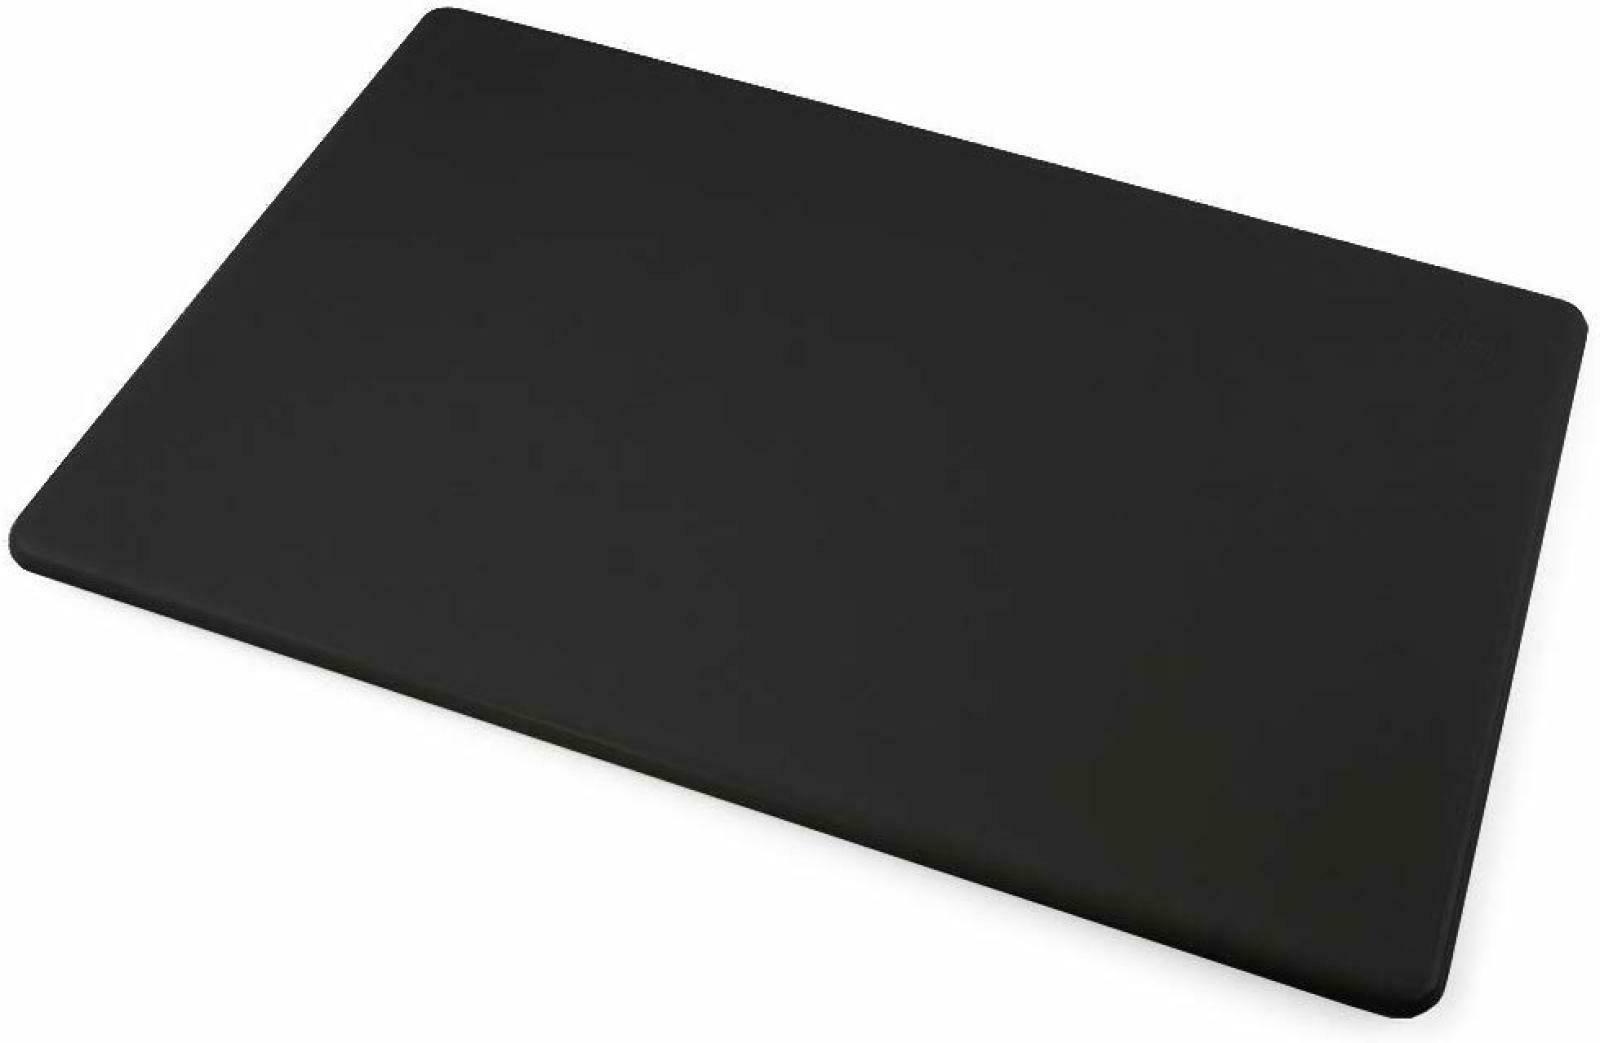 commercial plastic black cutting board